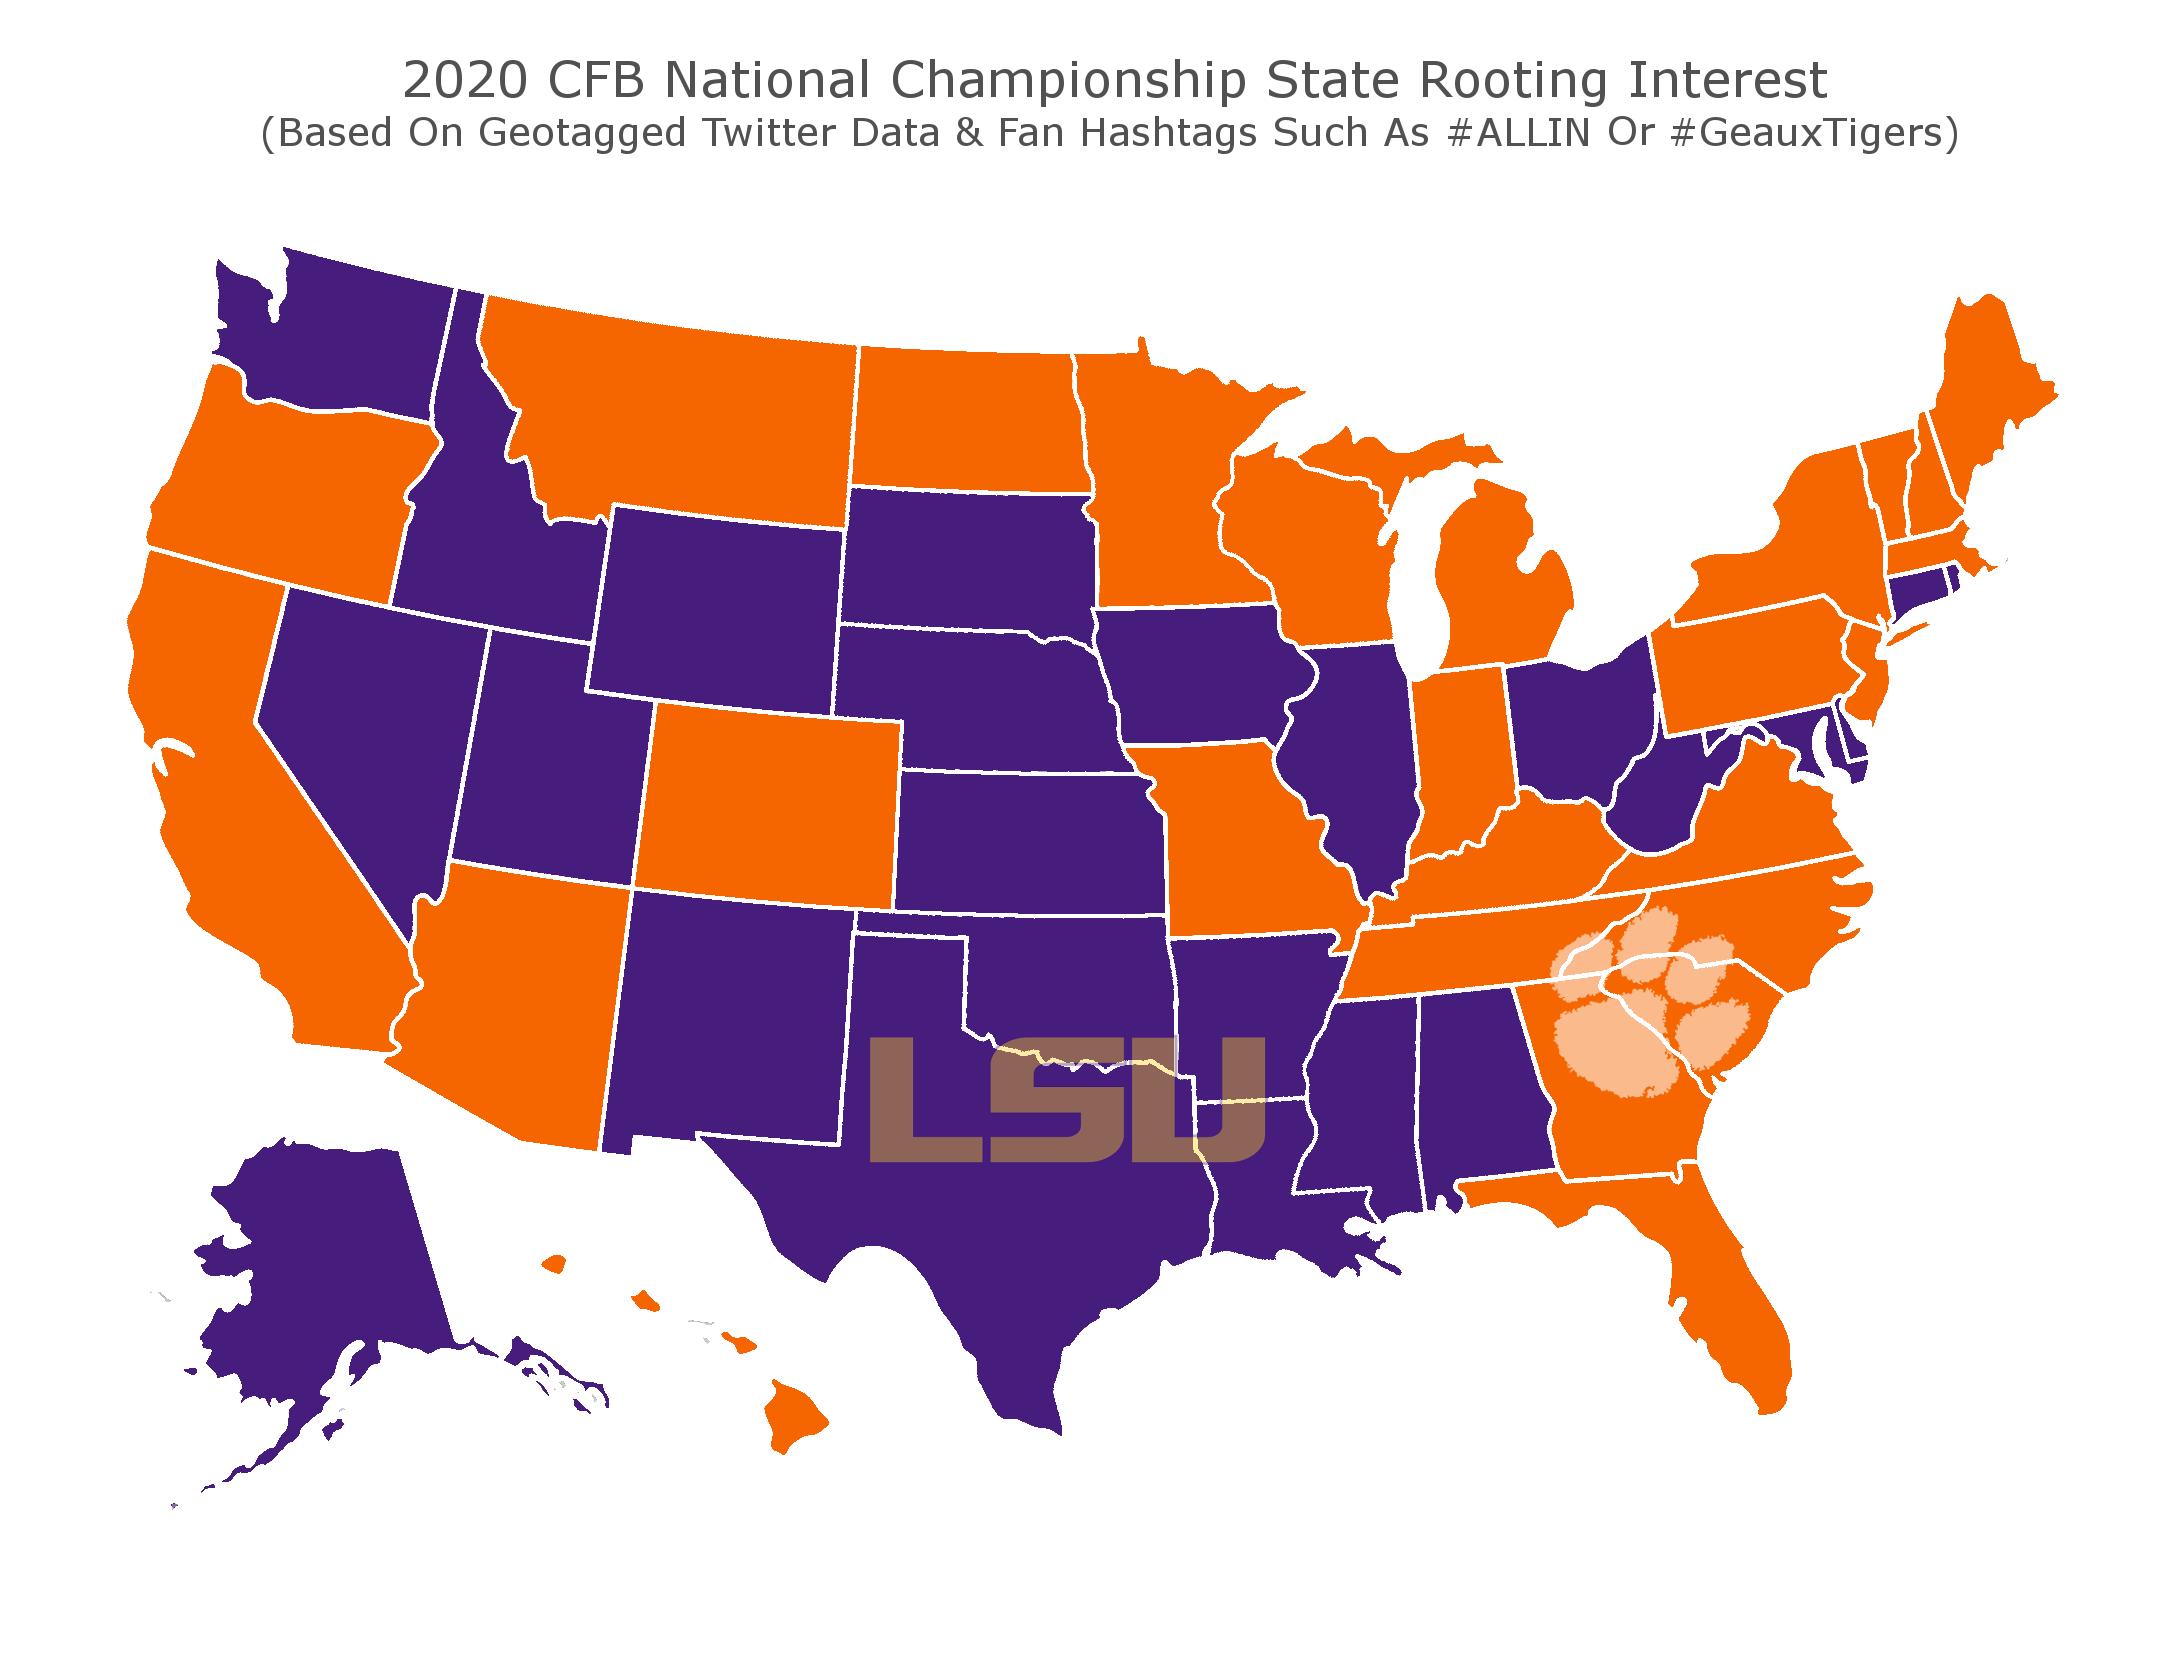 National Title Map (Credit: BetOnline.ag)